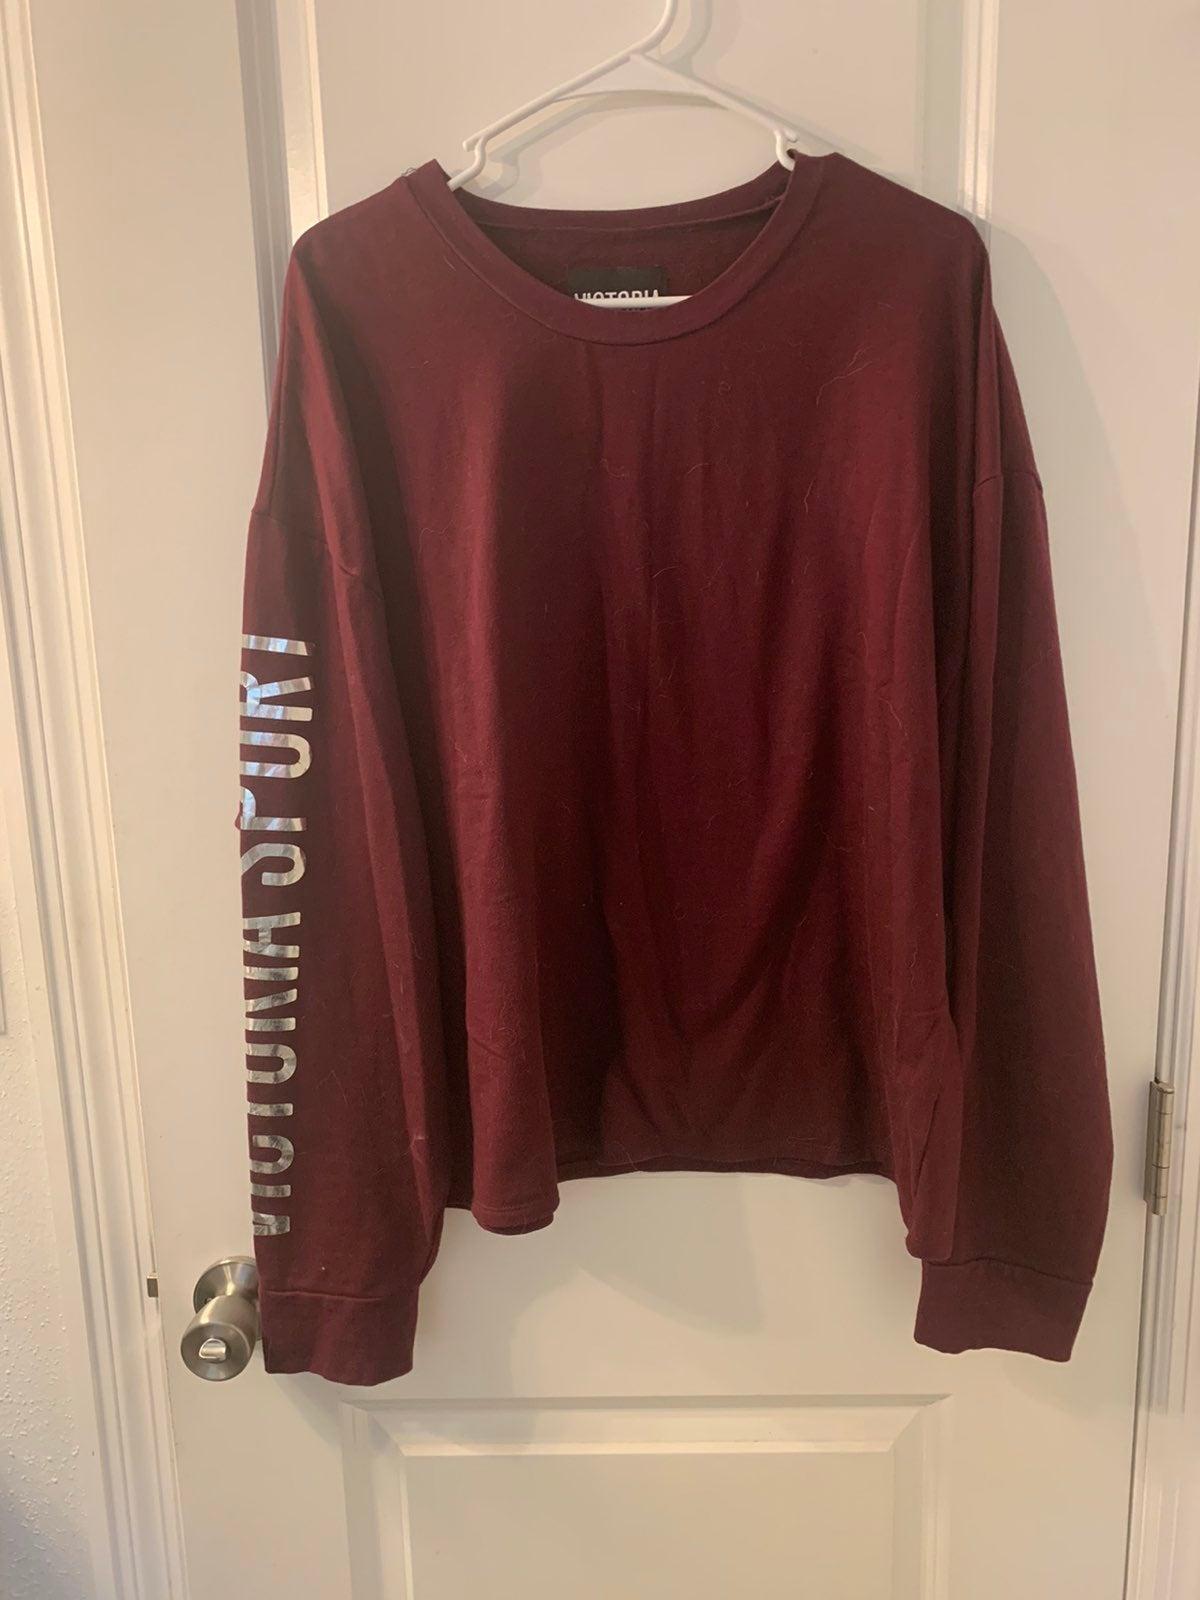 Womens crewneck sweater